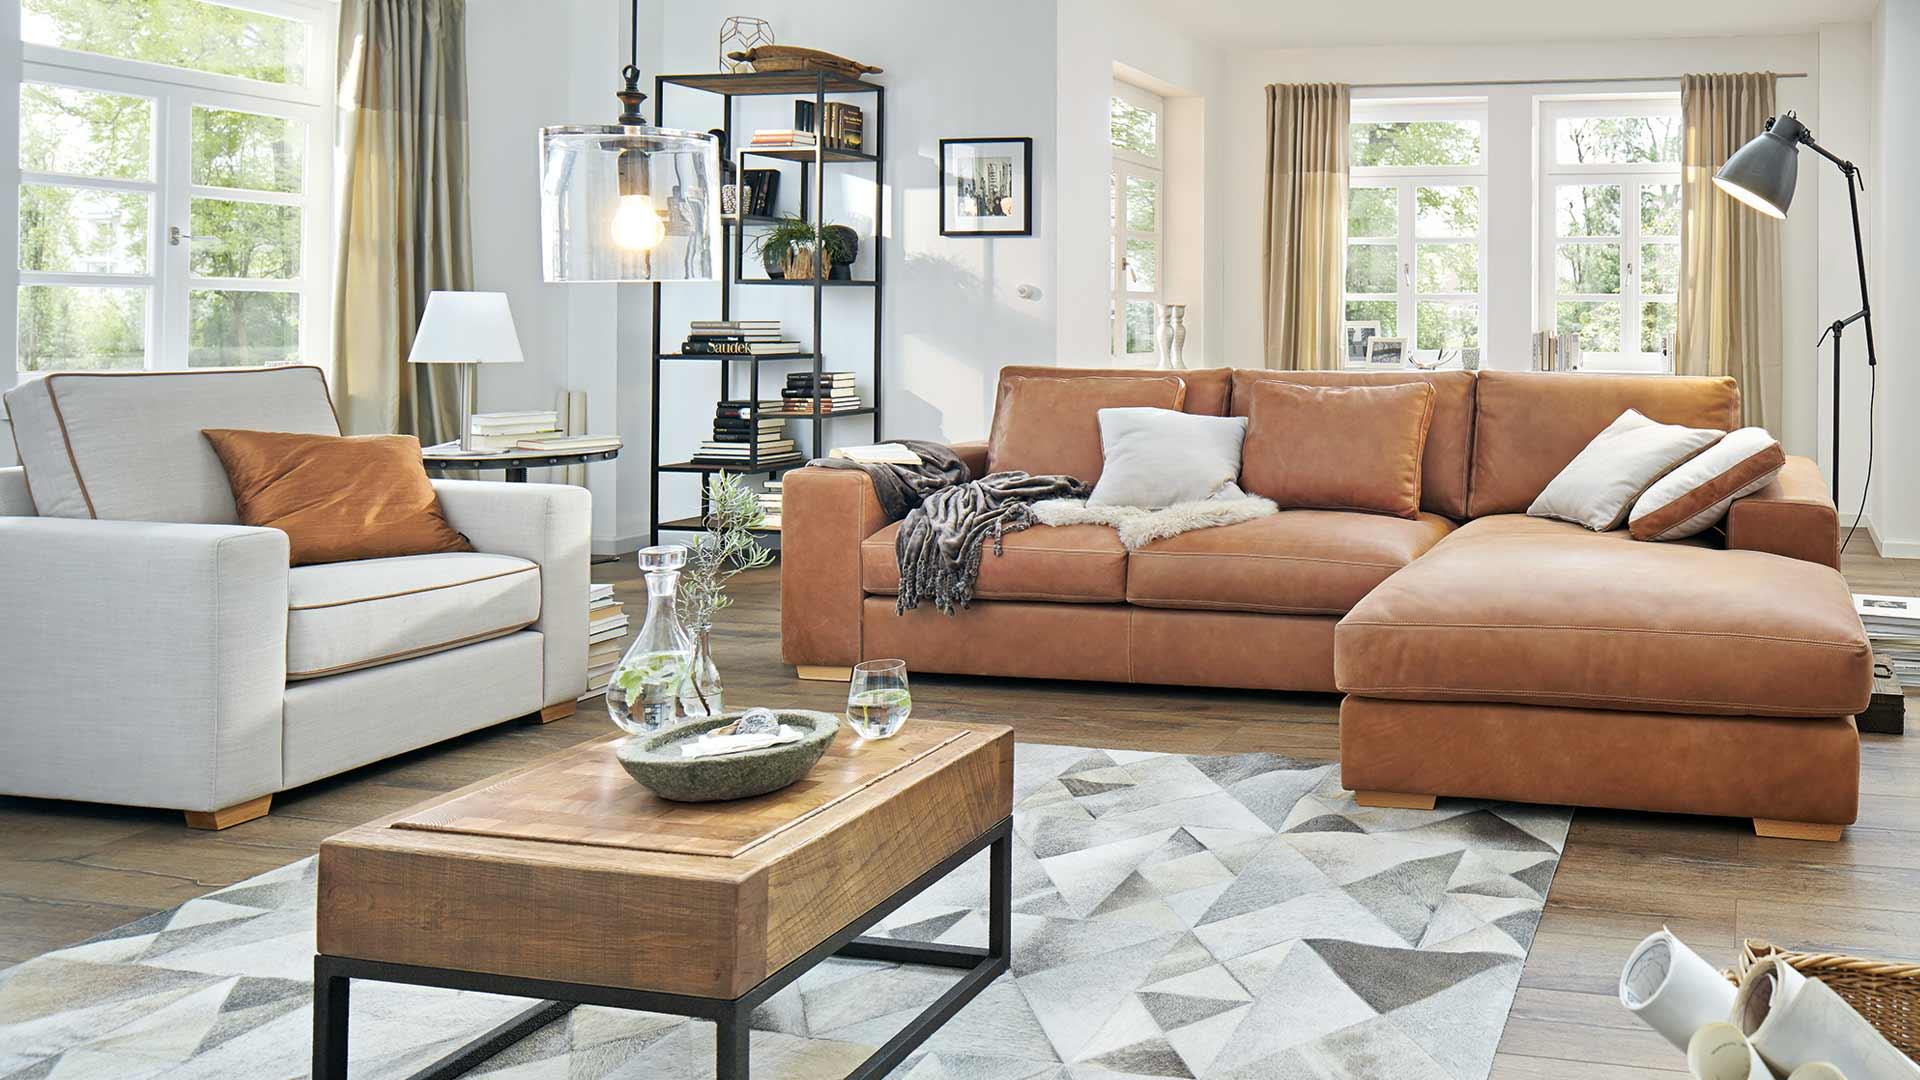 Full Size of Natura Sofa Brooklyn Couch Newport Denver Kaufen Gebraucht Kansas Love Livingston Home Pasadena U Form Xxl Günstig Landhaus Hussen Heimkino Leinen L Mit Sofa Natura Sofa